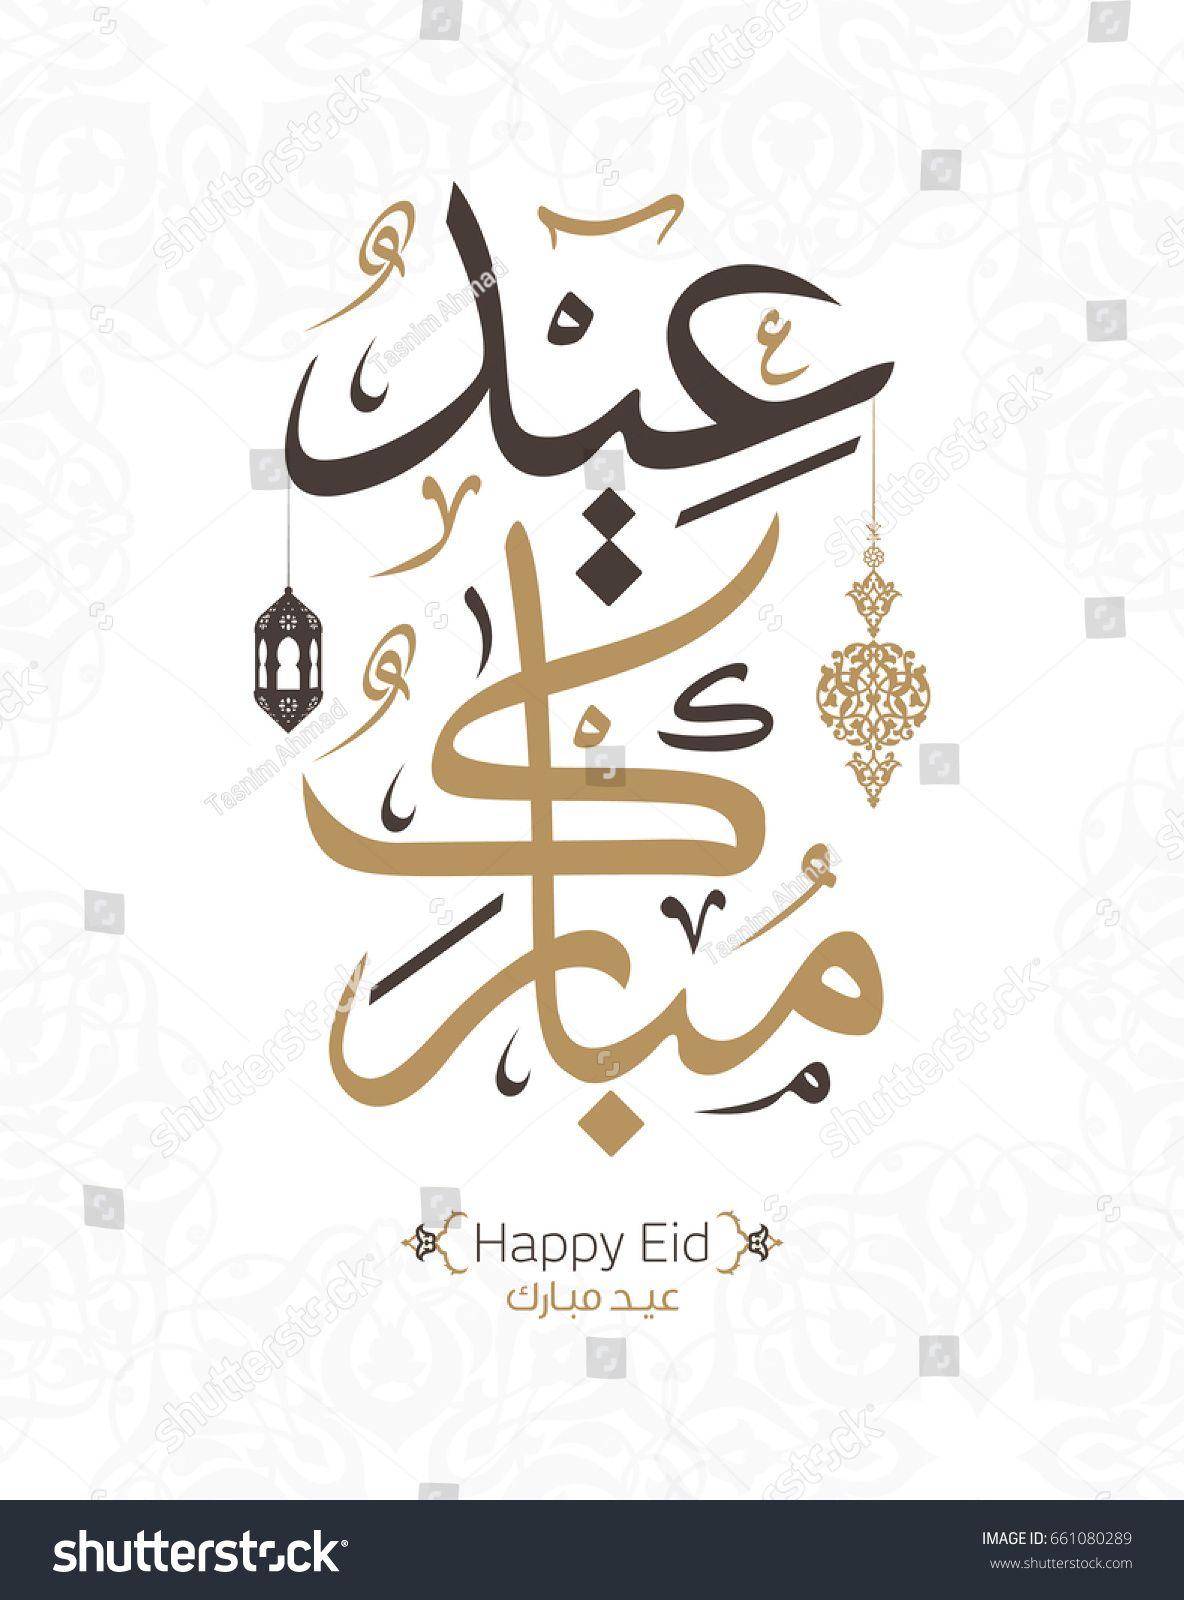 Vector Of Eid Mubarak Happy Eid For You In Arabic Calligraphy Style 1 Ad Affiliate Mubarak Eid Vector Happy Happy Eid Eid Eid Mubarak